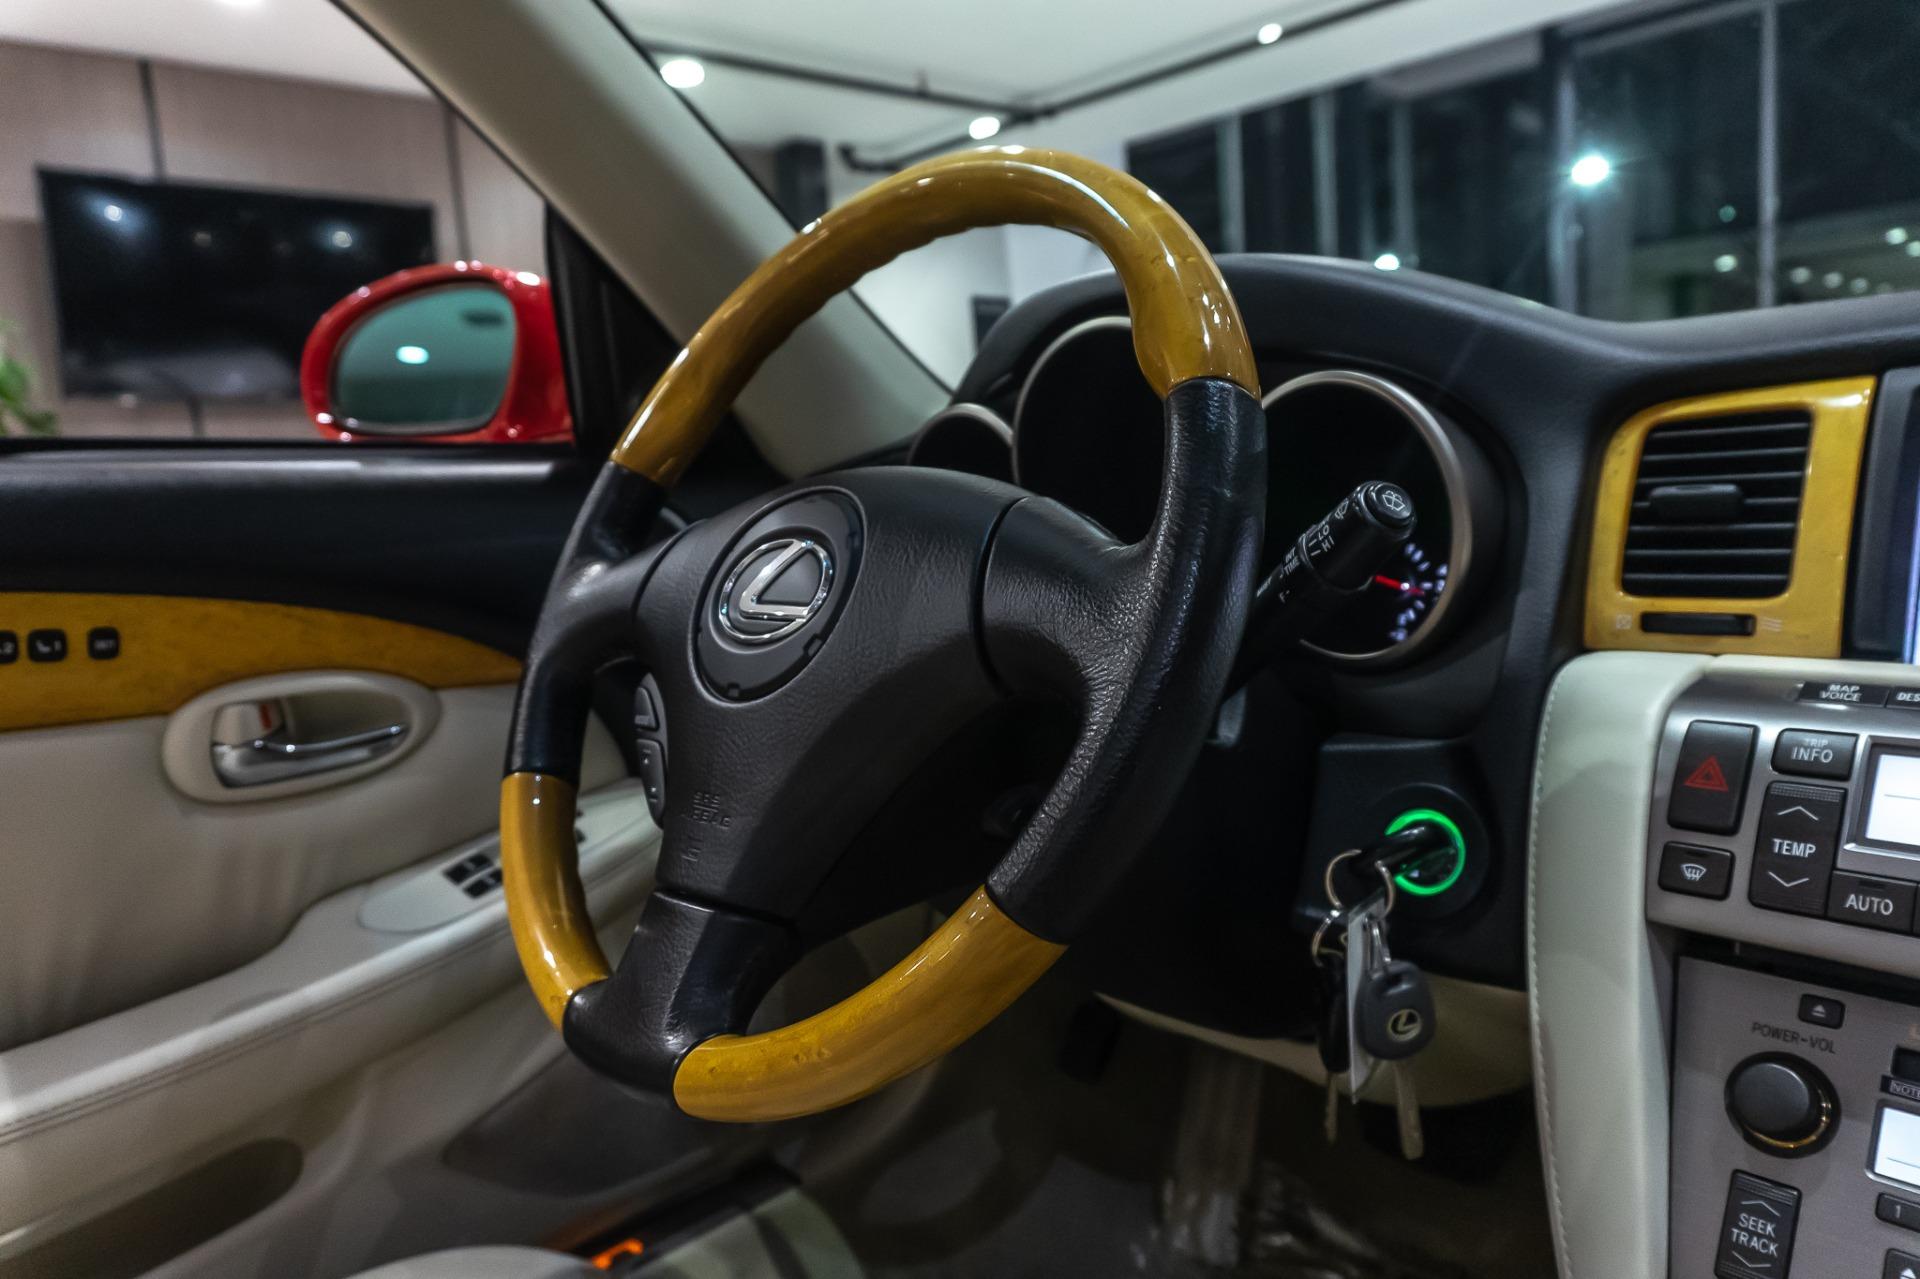 Used-2002-Lexus-SC430-Convertible-NAV-HEATED-SEATS-REAR-SPOILER-ONLY-25K-MILES